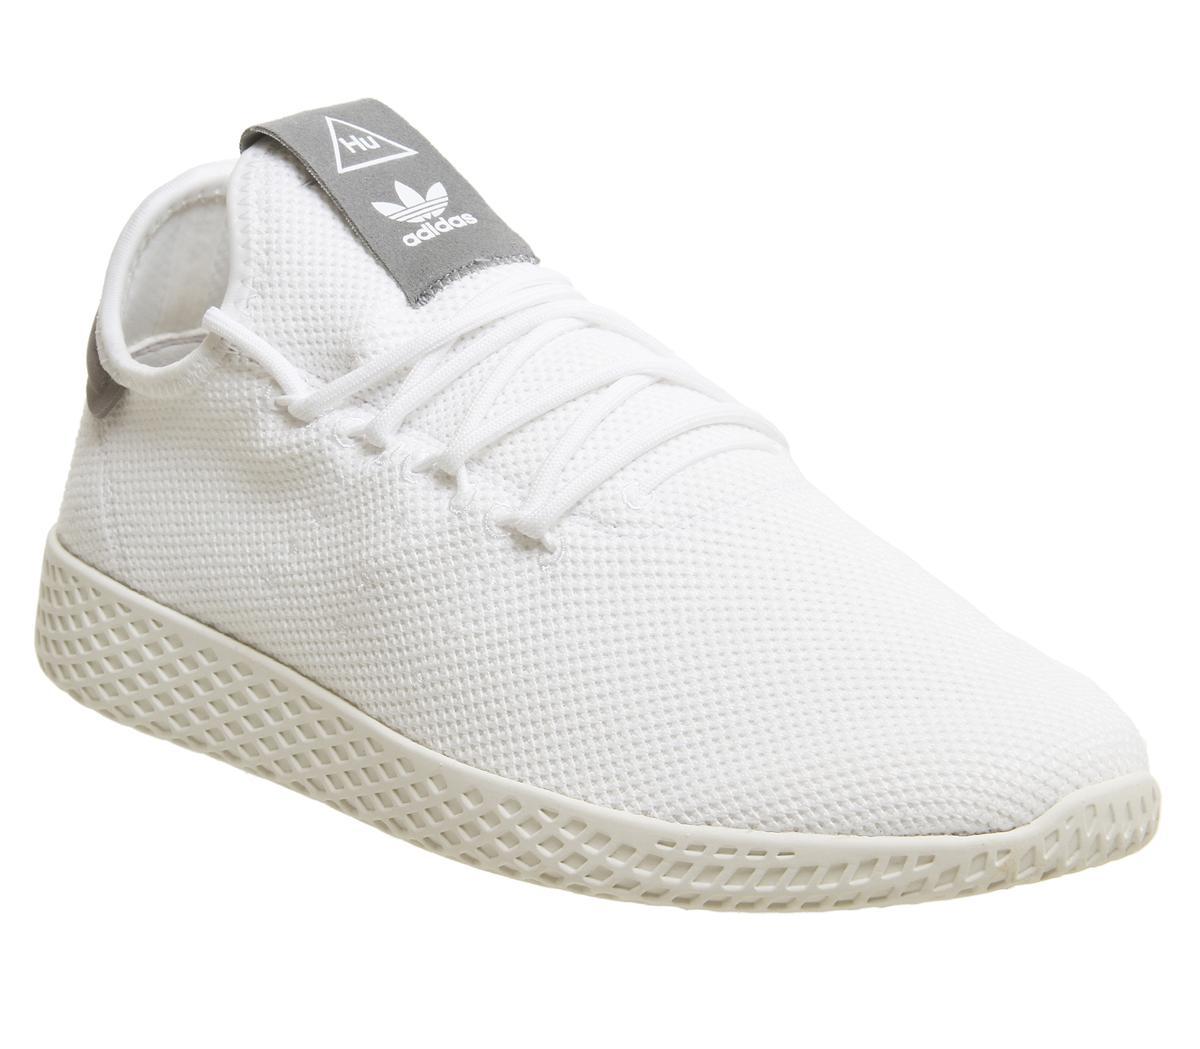 d56273b06aa50 adidas Pw Tennis Trainers White Grey - Unisex Sports